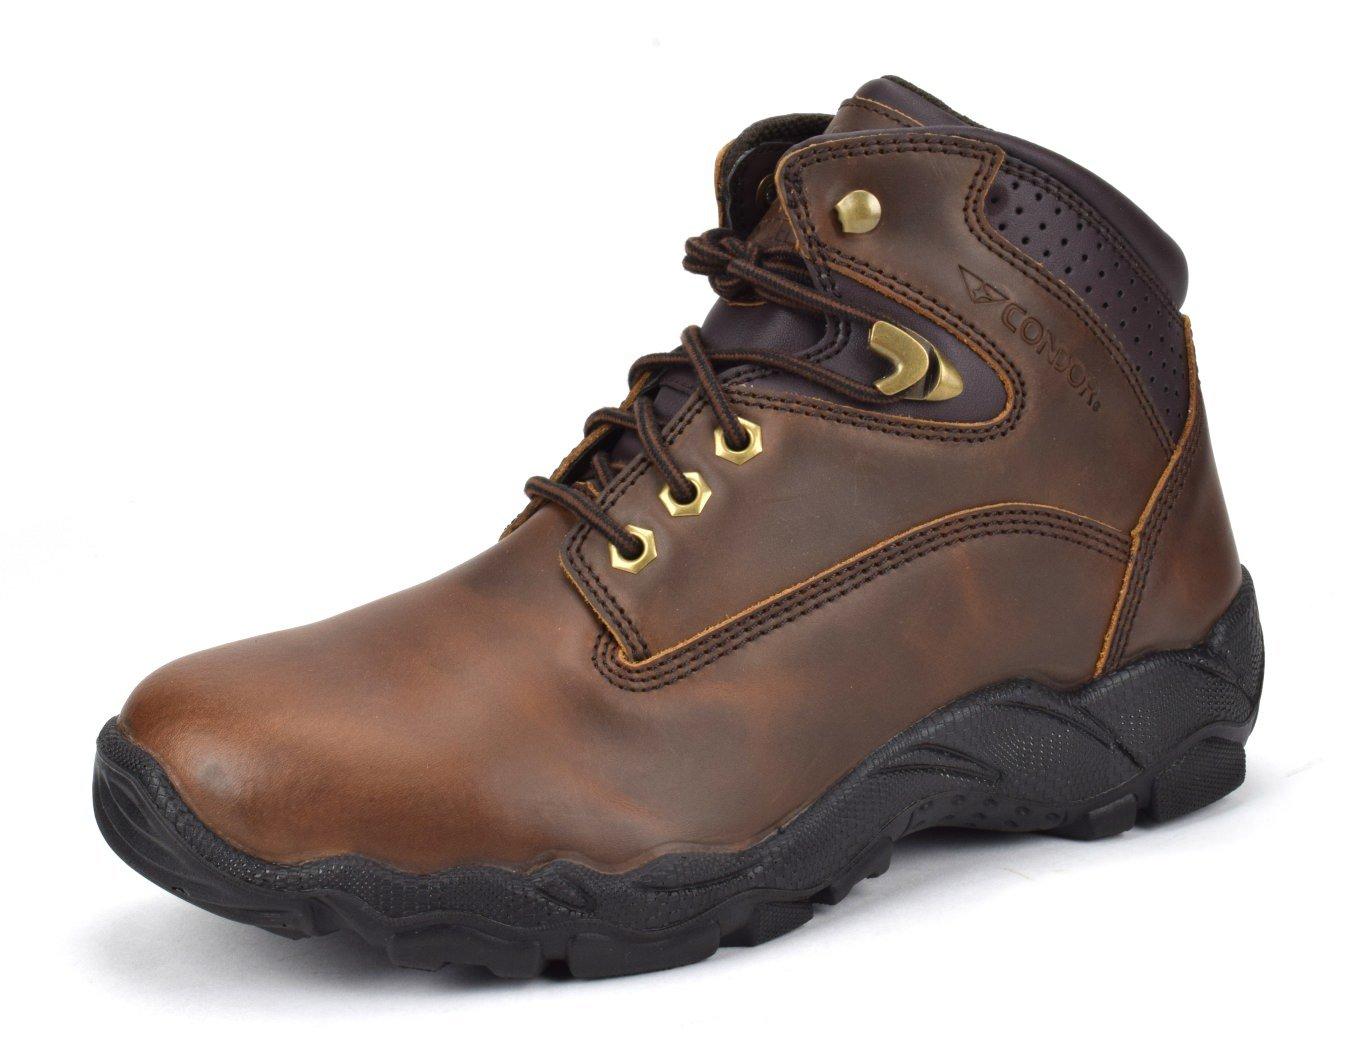 CONDOR Idaho Men's 6'' Steel Toe Work Boot - Brown, Size 8 E US